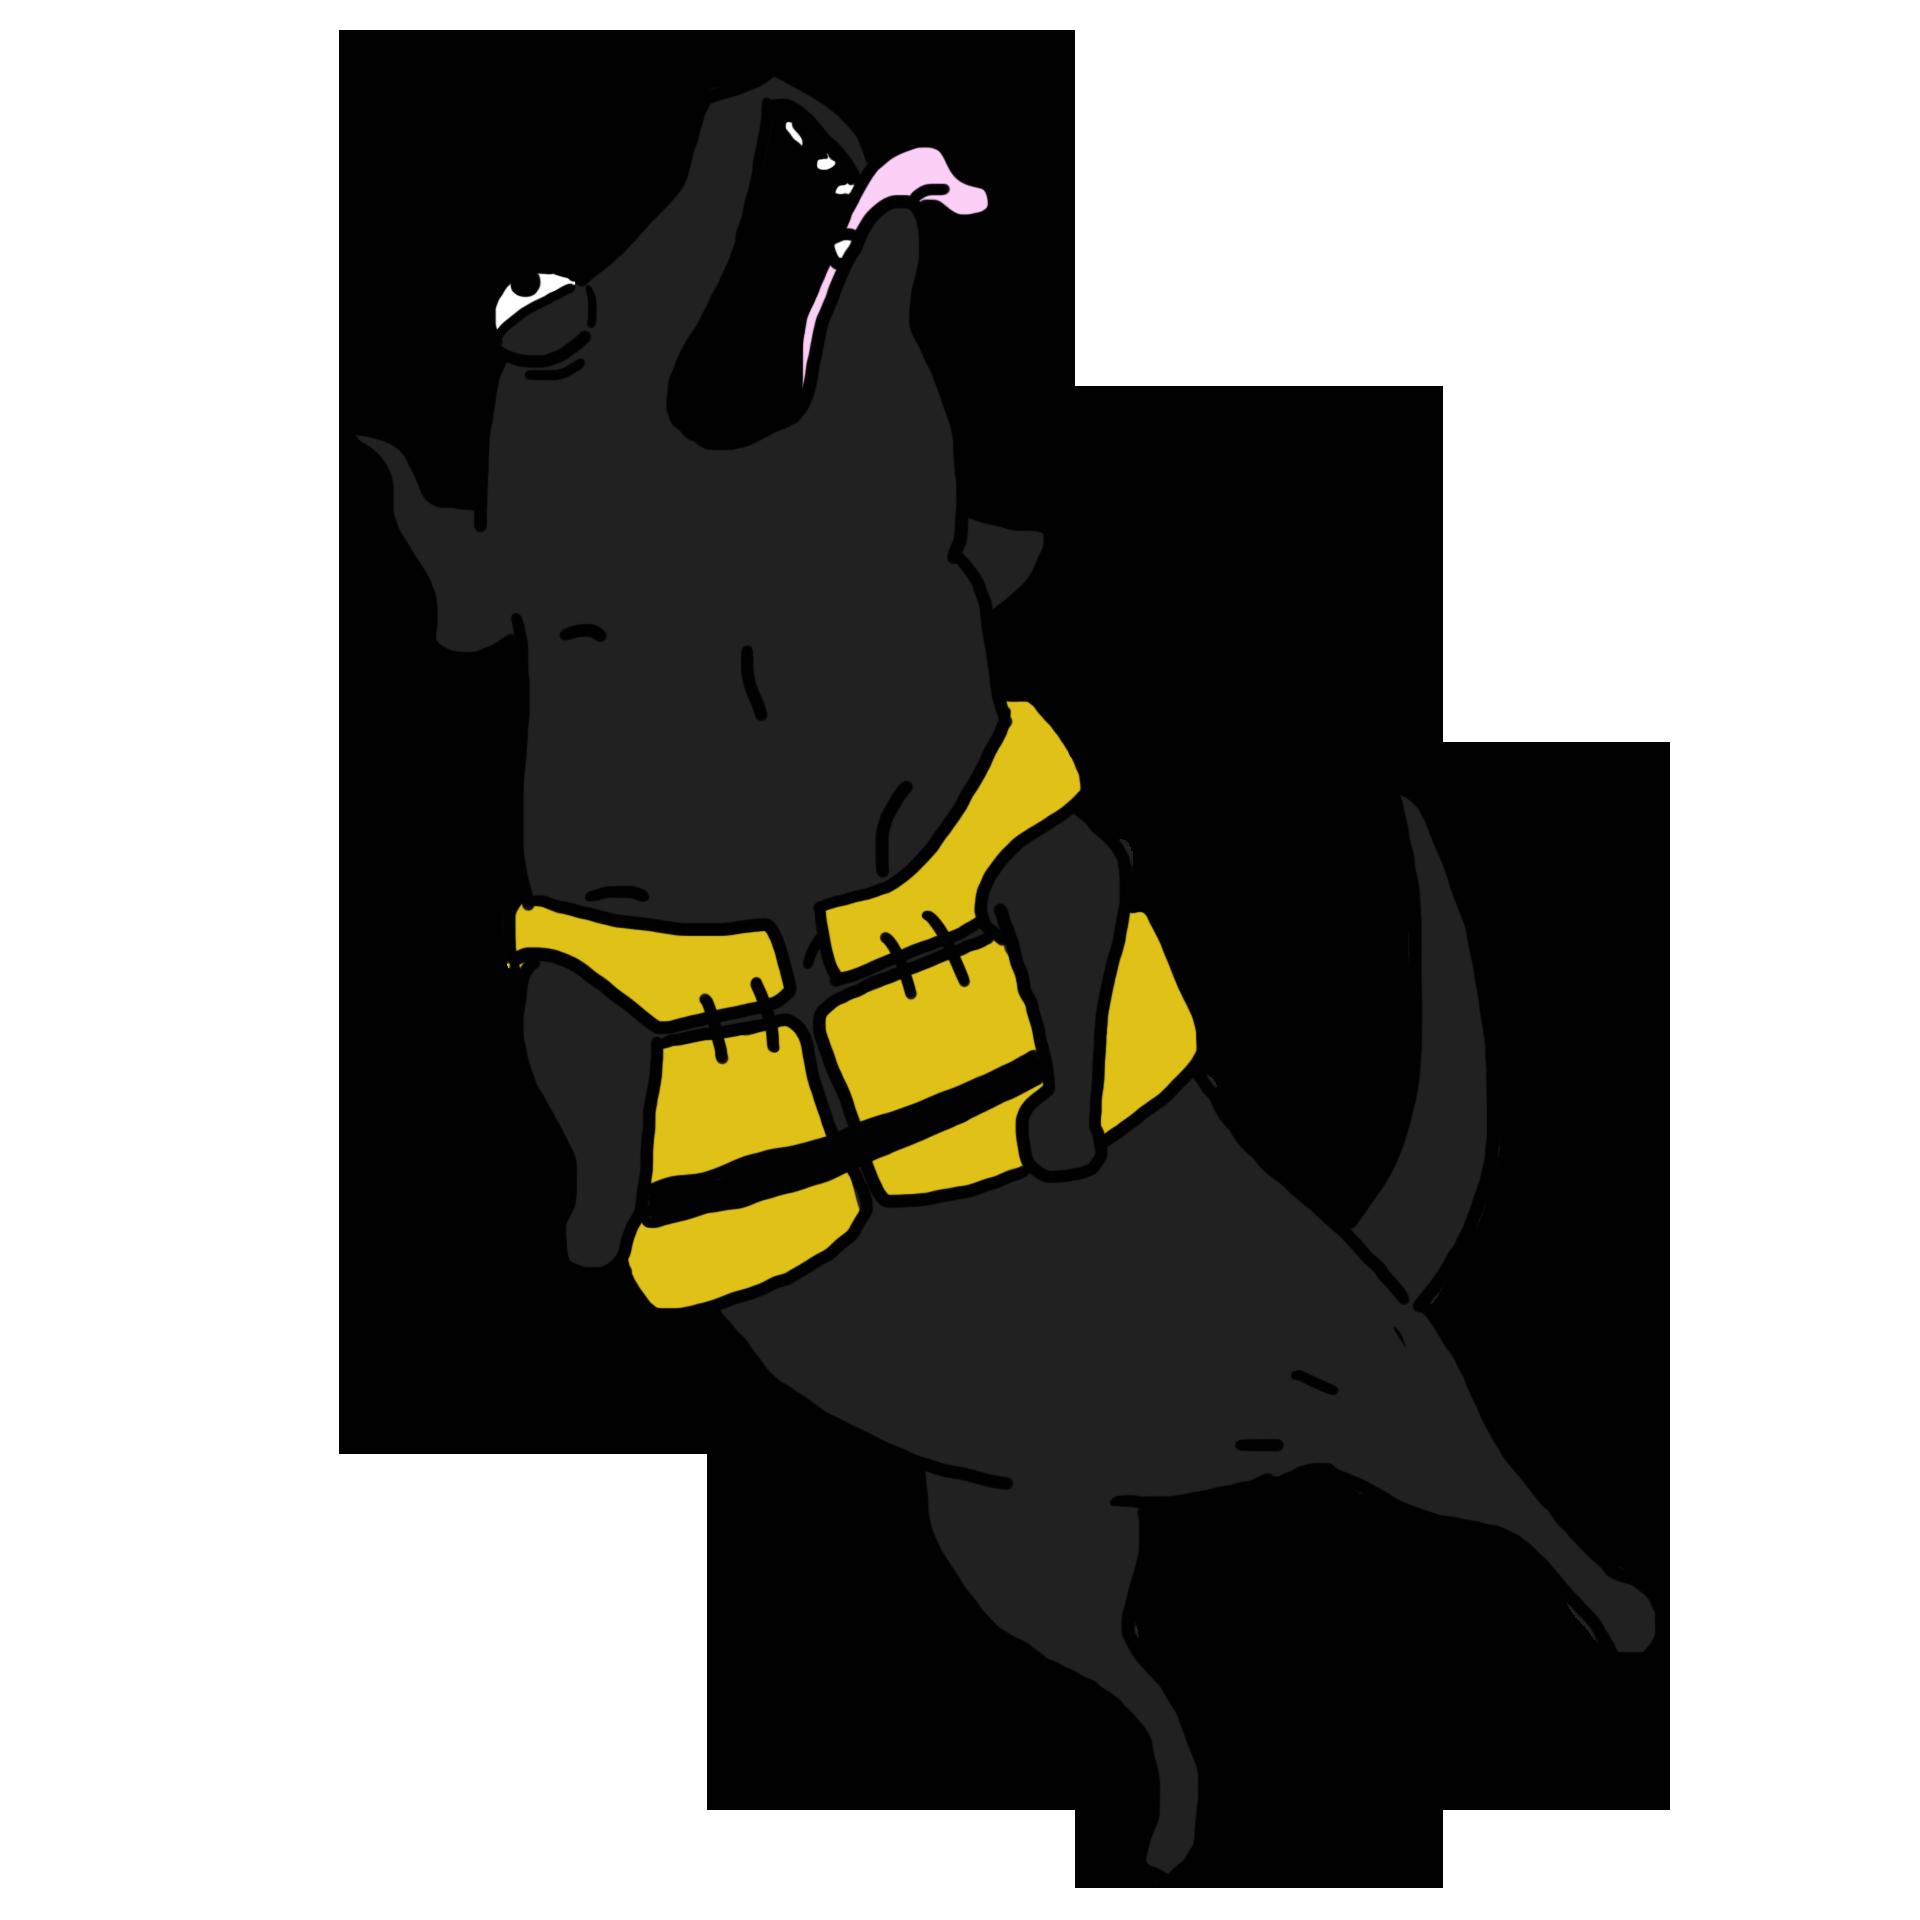 3.-Tucker-whale-poop-dog.png